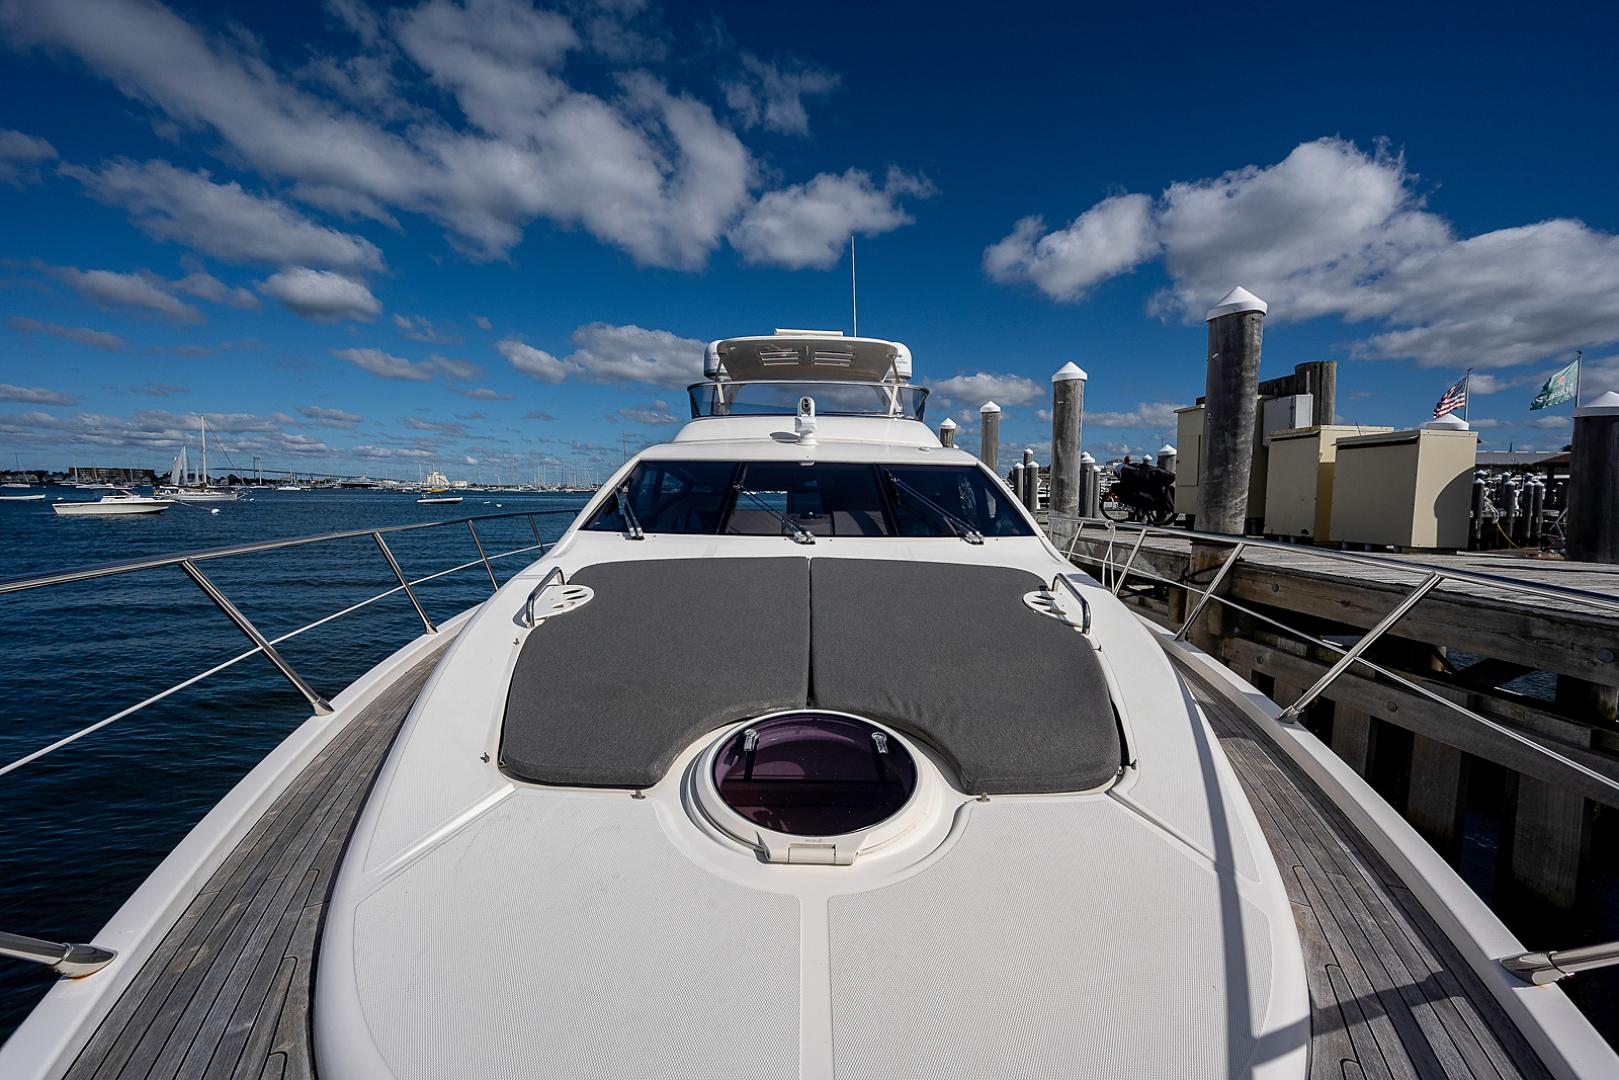 Azimut-58 Fly Motor Yacht 2011-Nova Fort Lauderdale-Florida-United States-58_azimut_nova__bow13-1490490 | Thumbnail